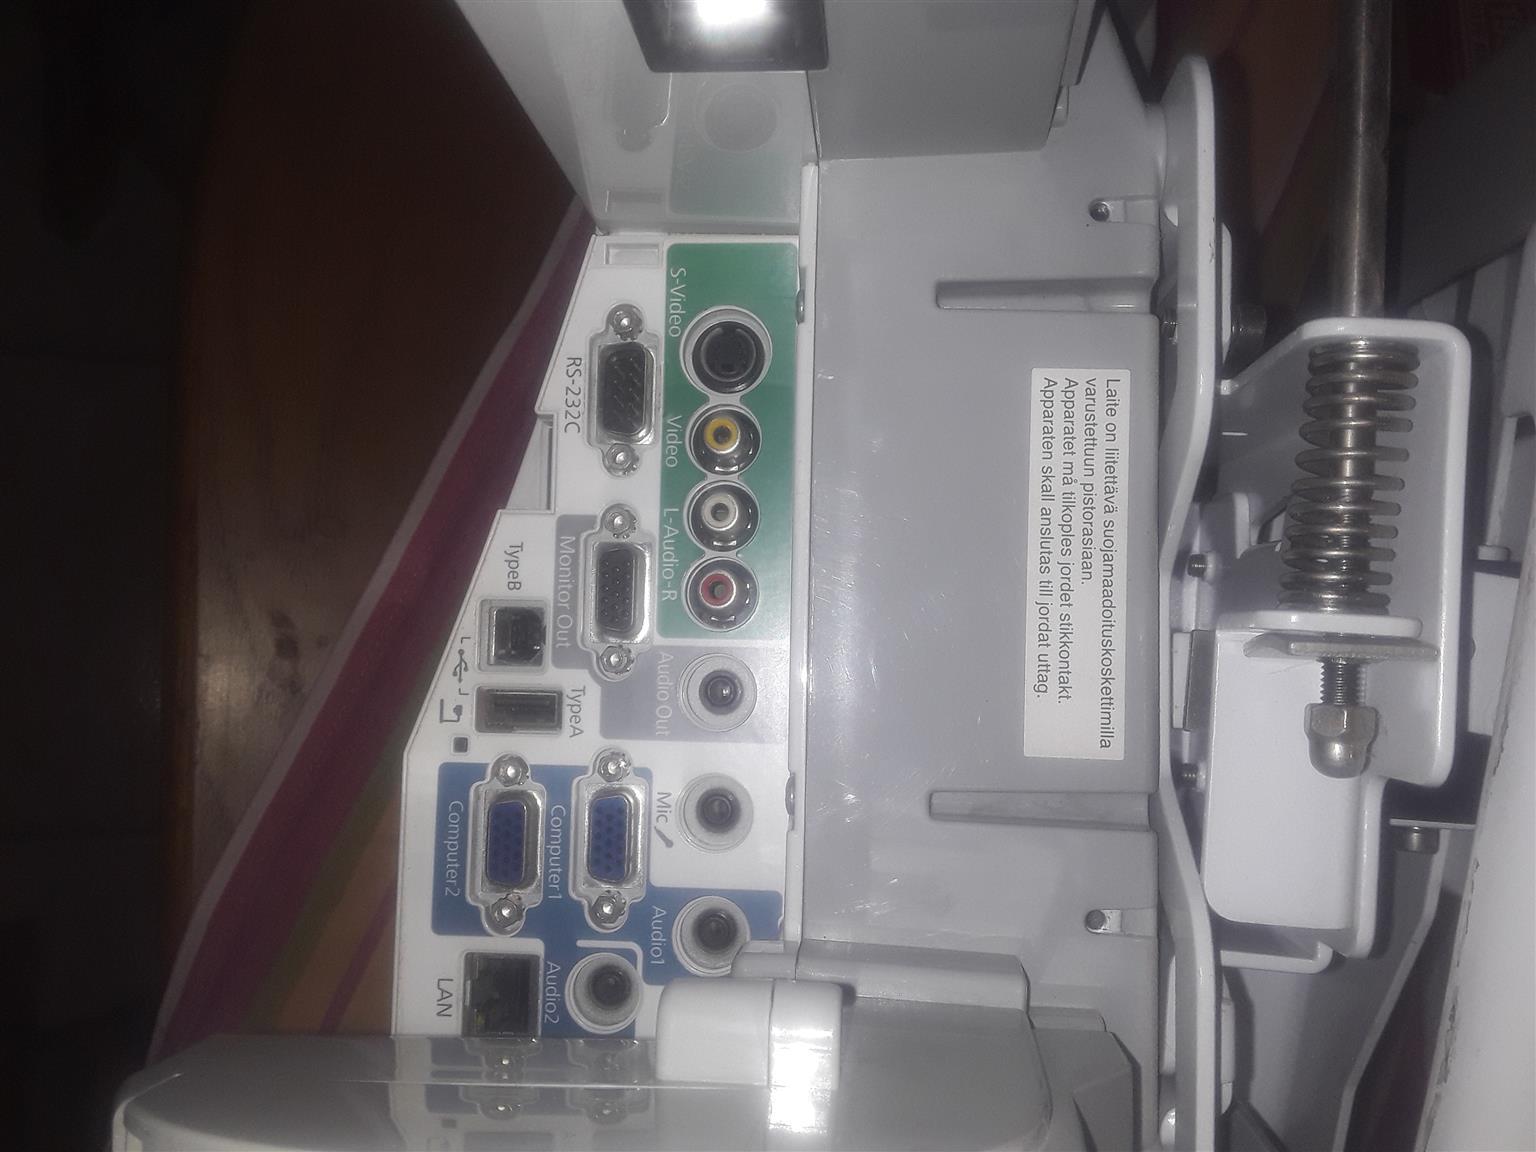 Epson EB460 overhead projector.